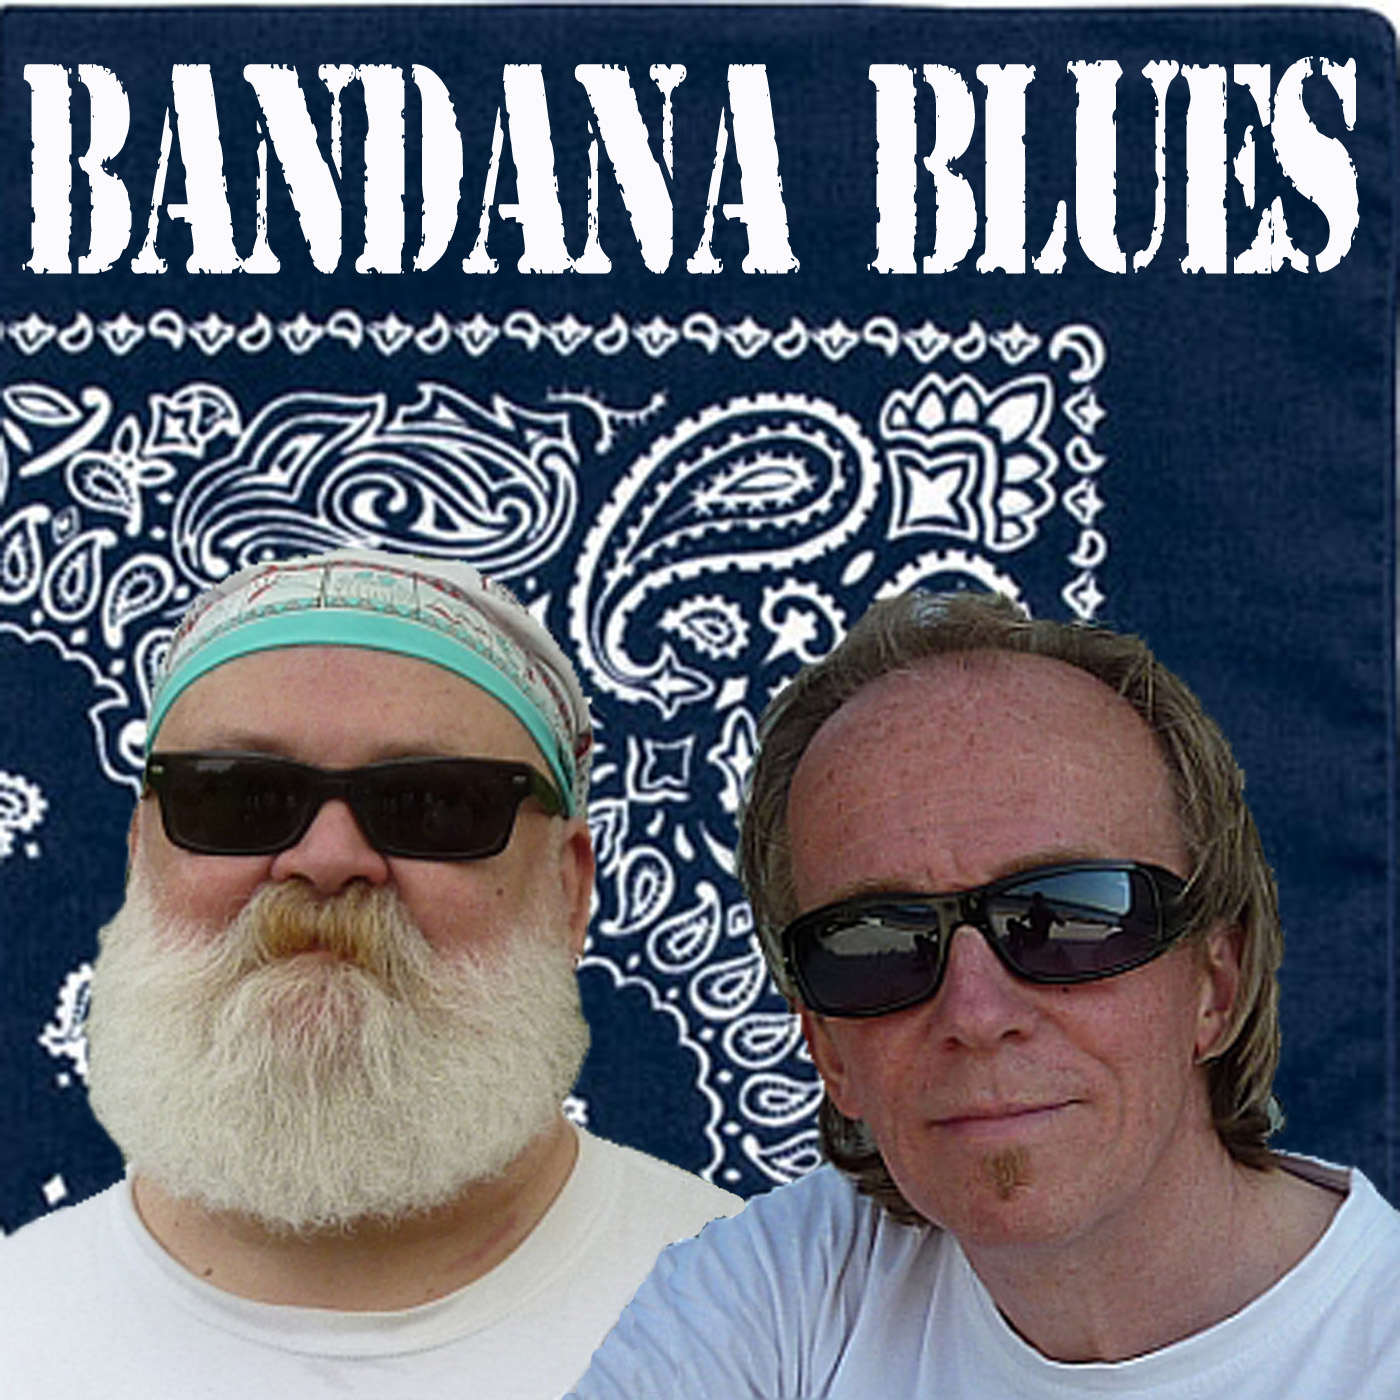 dc8dc15f8e3 Bandana Blues